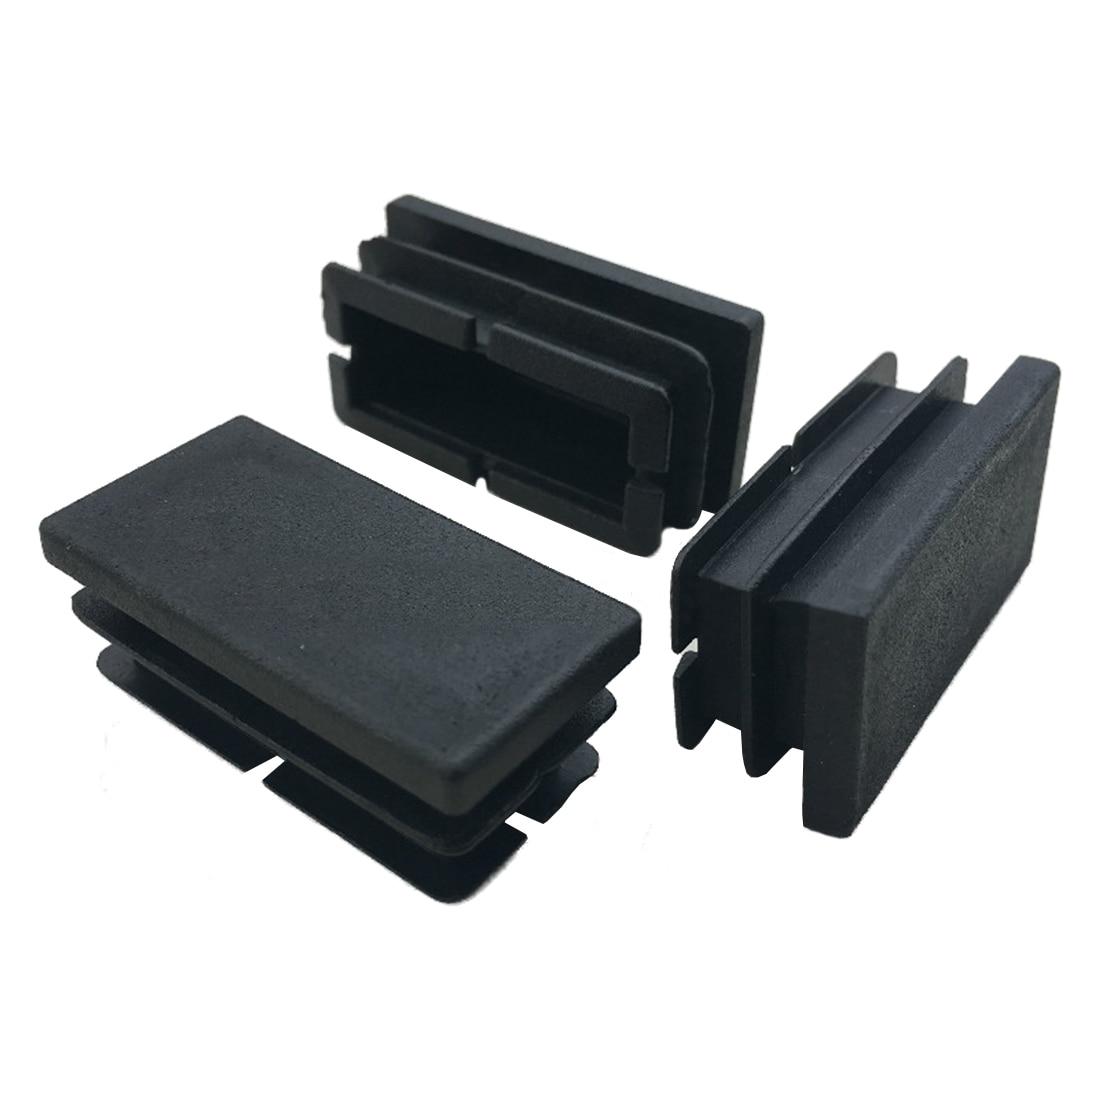 Fashion-8 Pcs Black Plastic Rectangular Blanking End Caps Inserts 20mm X 40mm